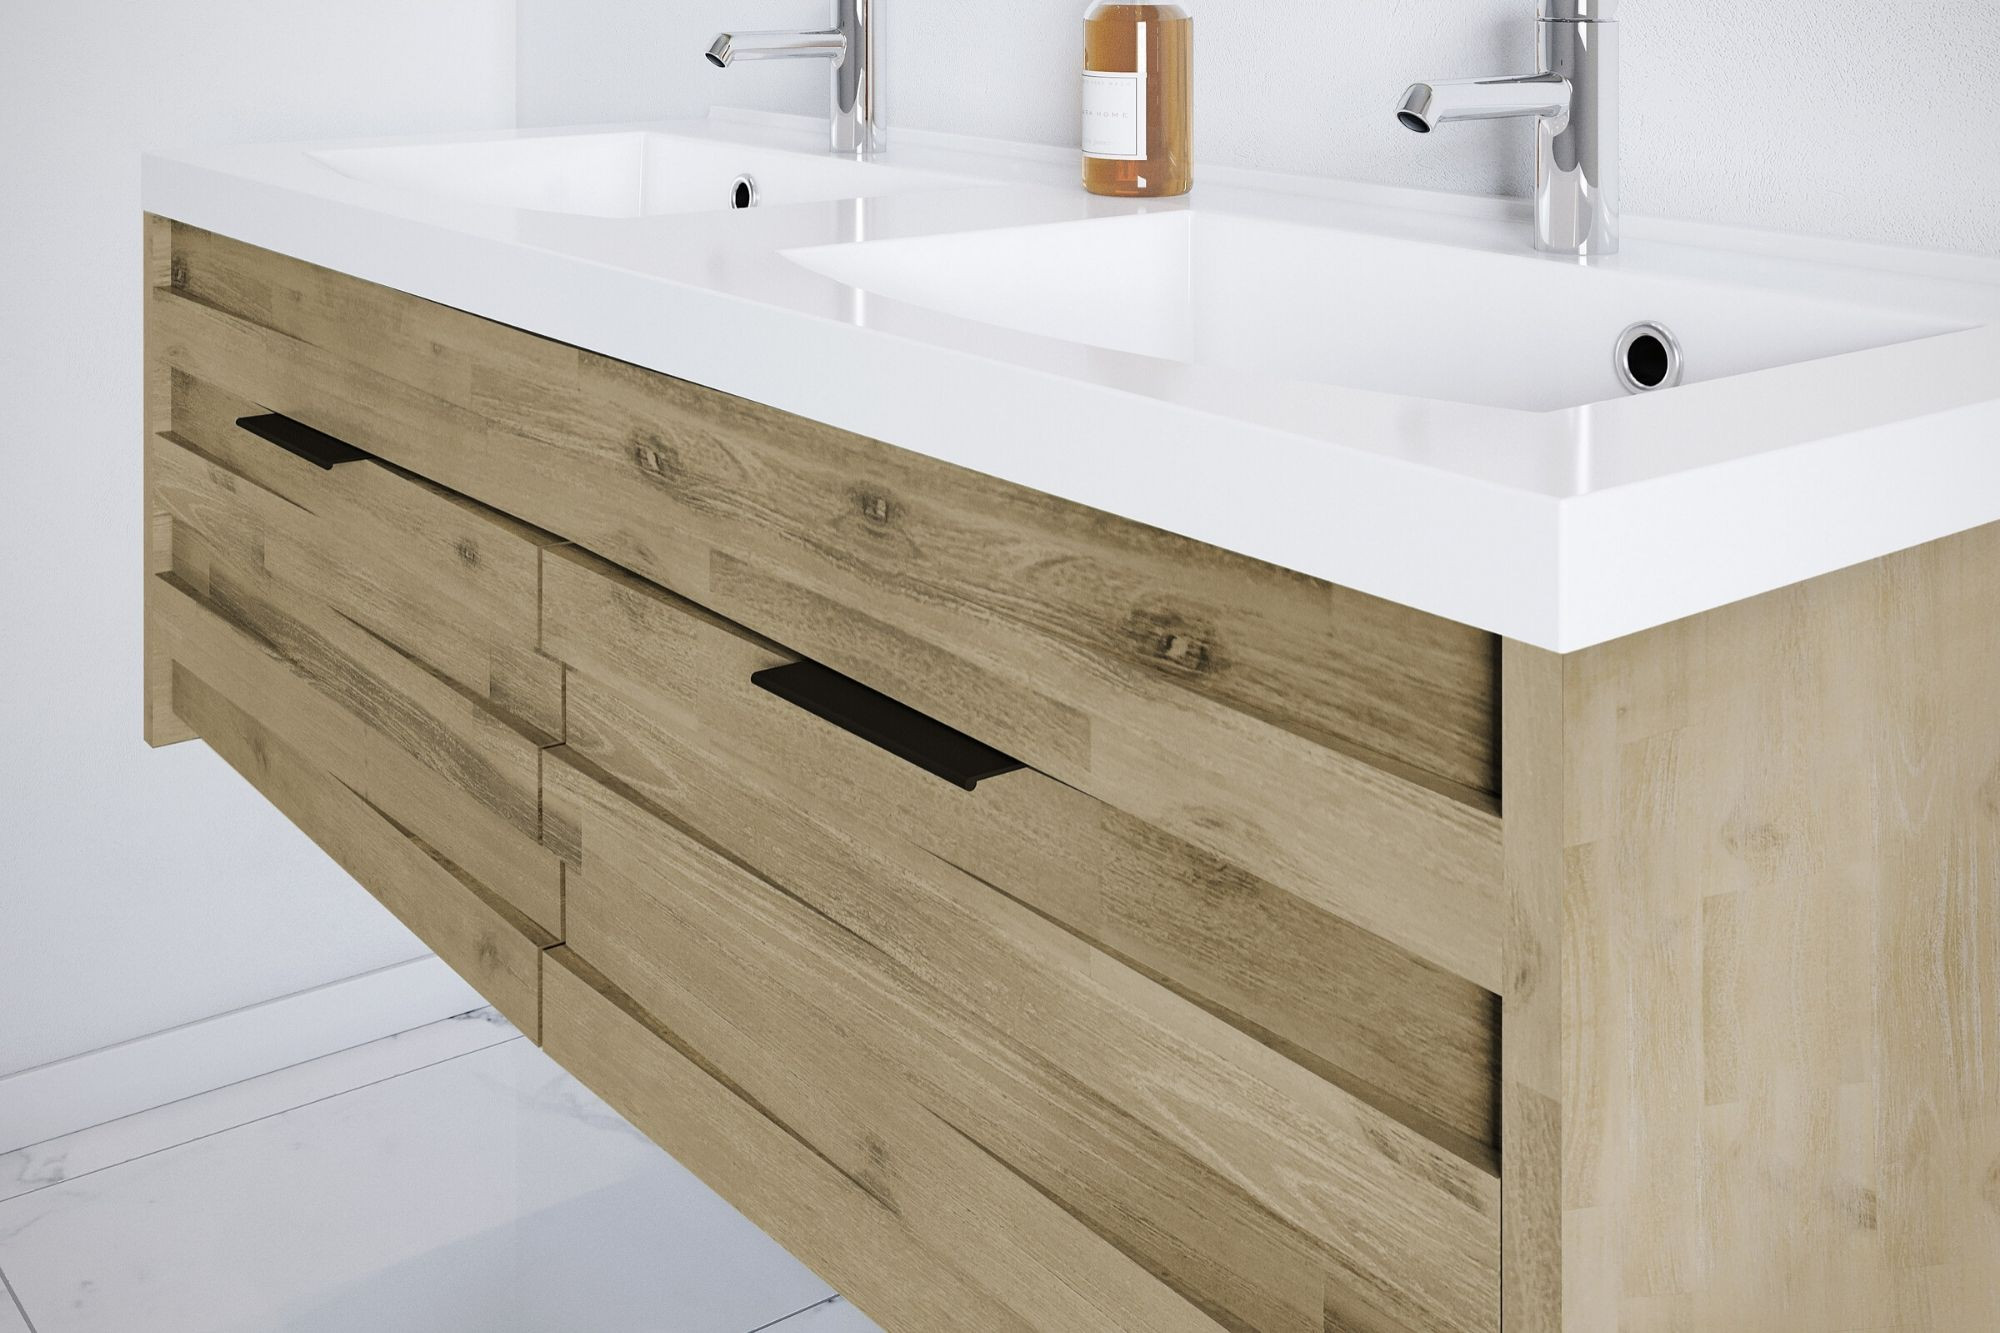 Meuble de salle de bain 15 cm en bois massif et sa double vasque - Hellin